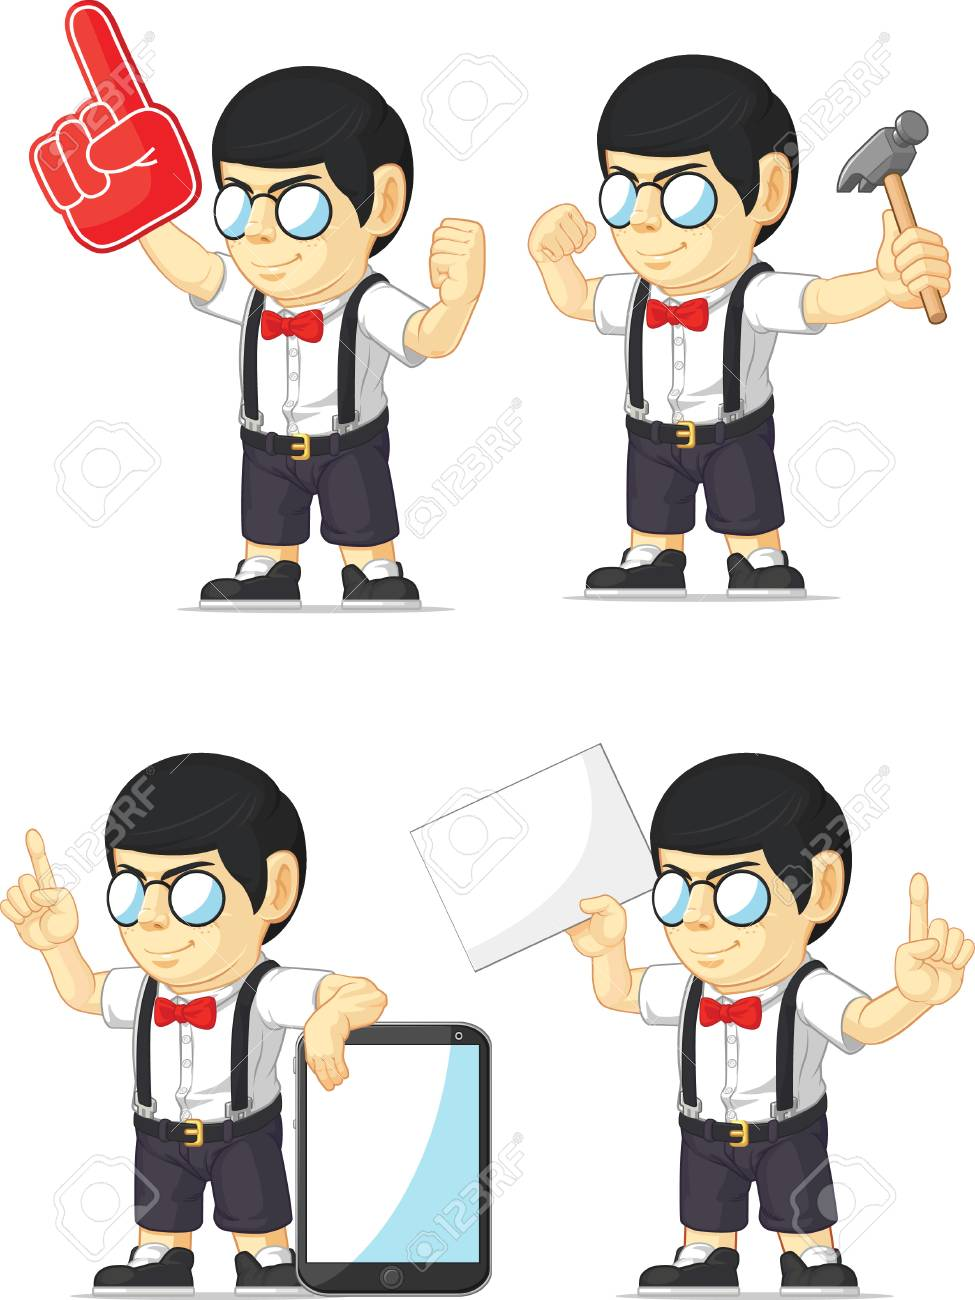 Nerd Boy Customizable Mascot 11 Stock Vector - 27144685